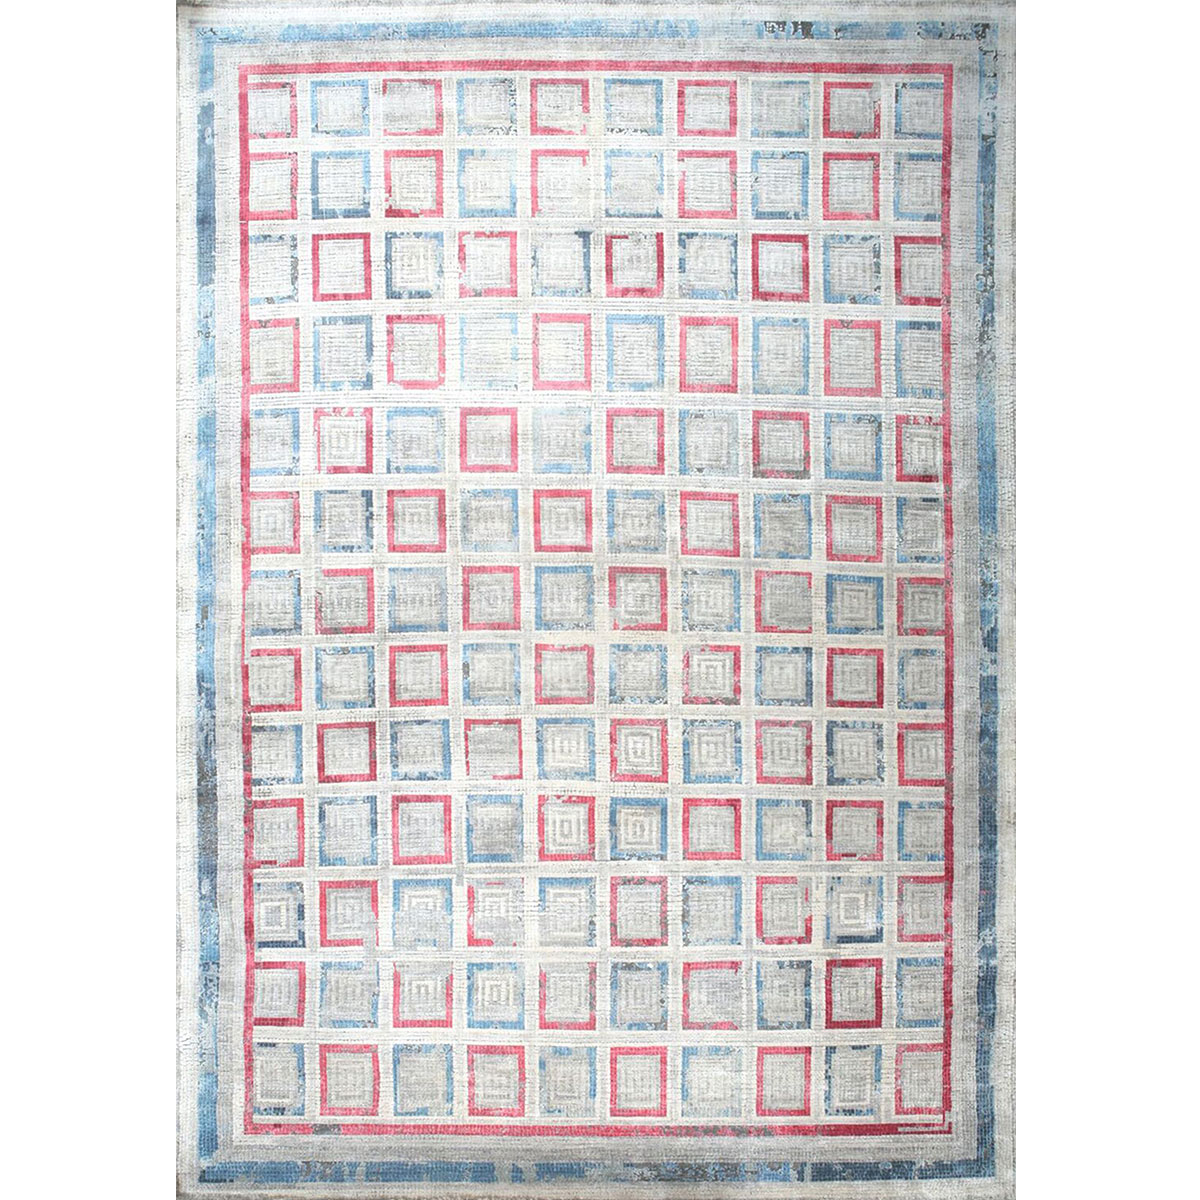 hadrian_wool-silk_hand-knotted_patterson-flynn-martin_pfm